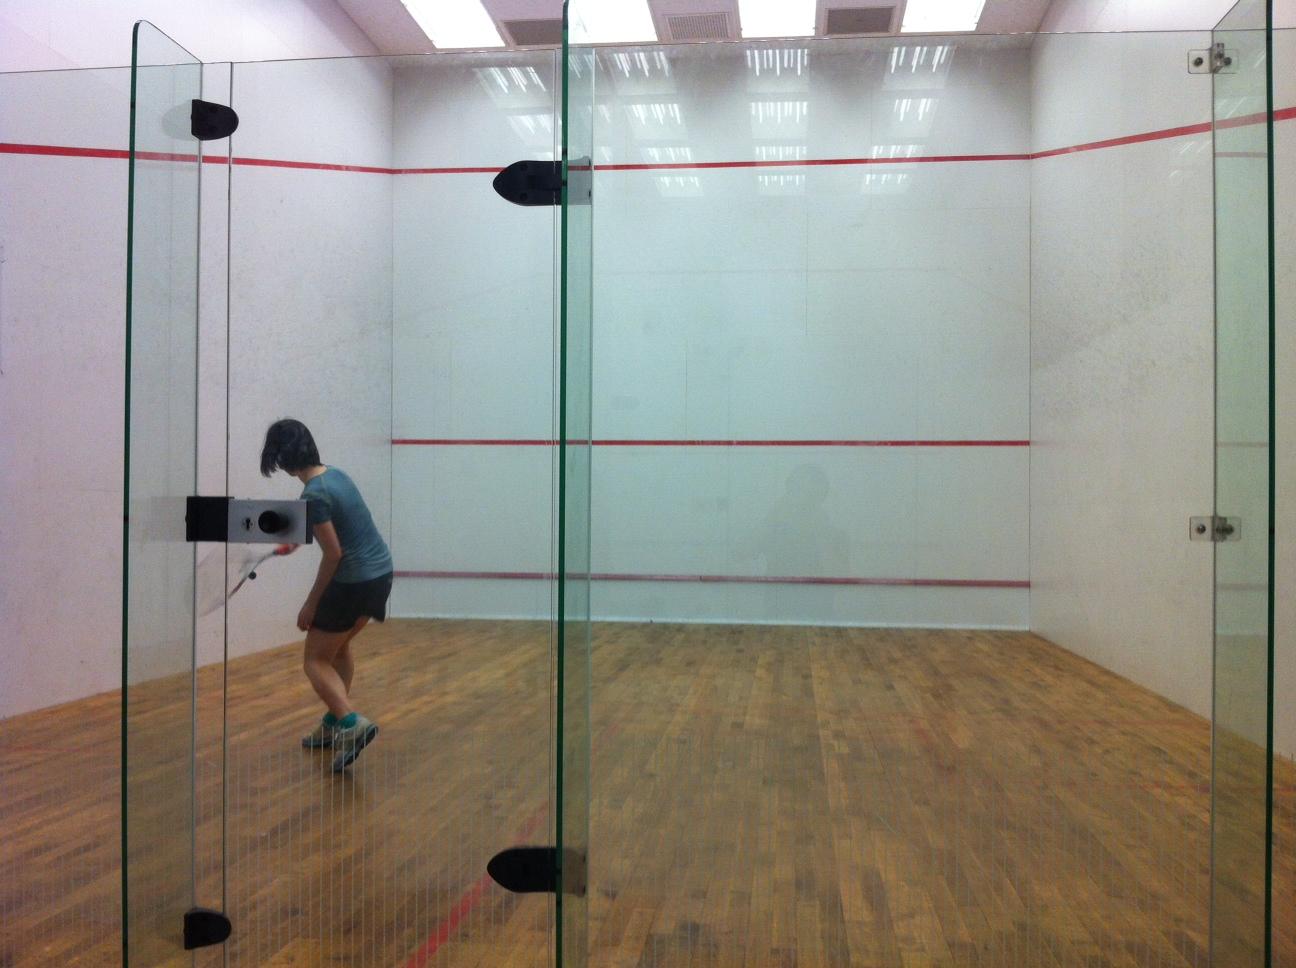 羽夢: Squash 壁球拍 入手!